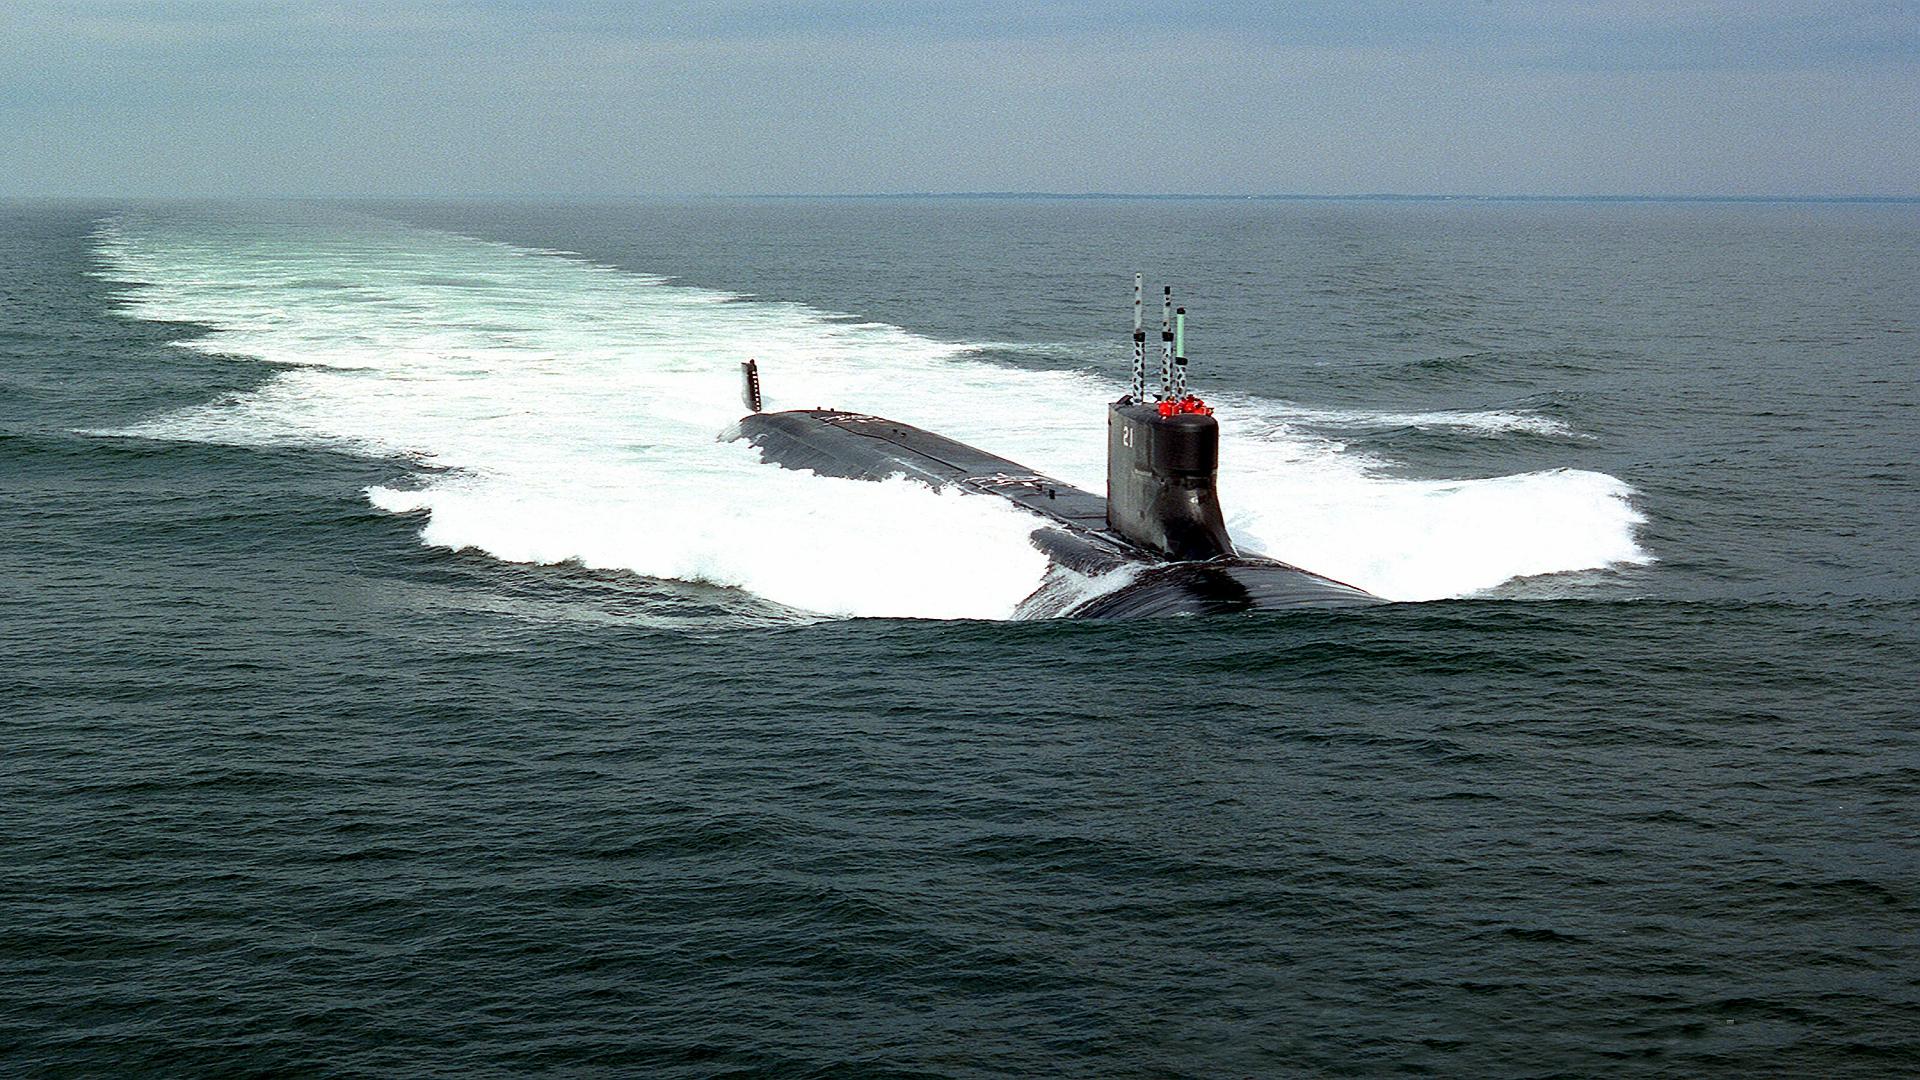 Military submarines wallpaper   wallpapers download wallpaper 1920x1080